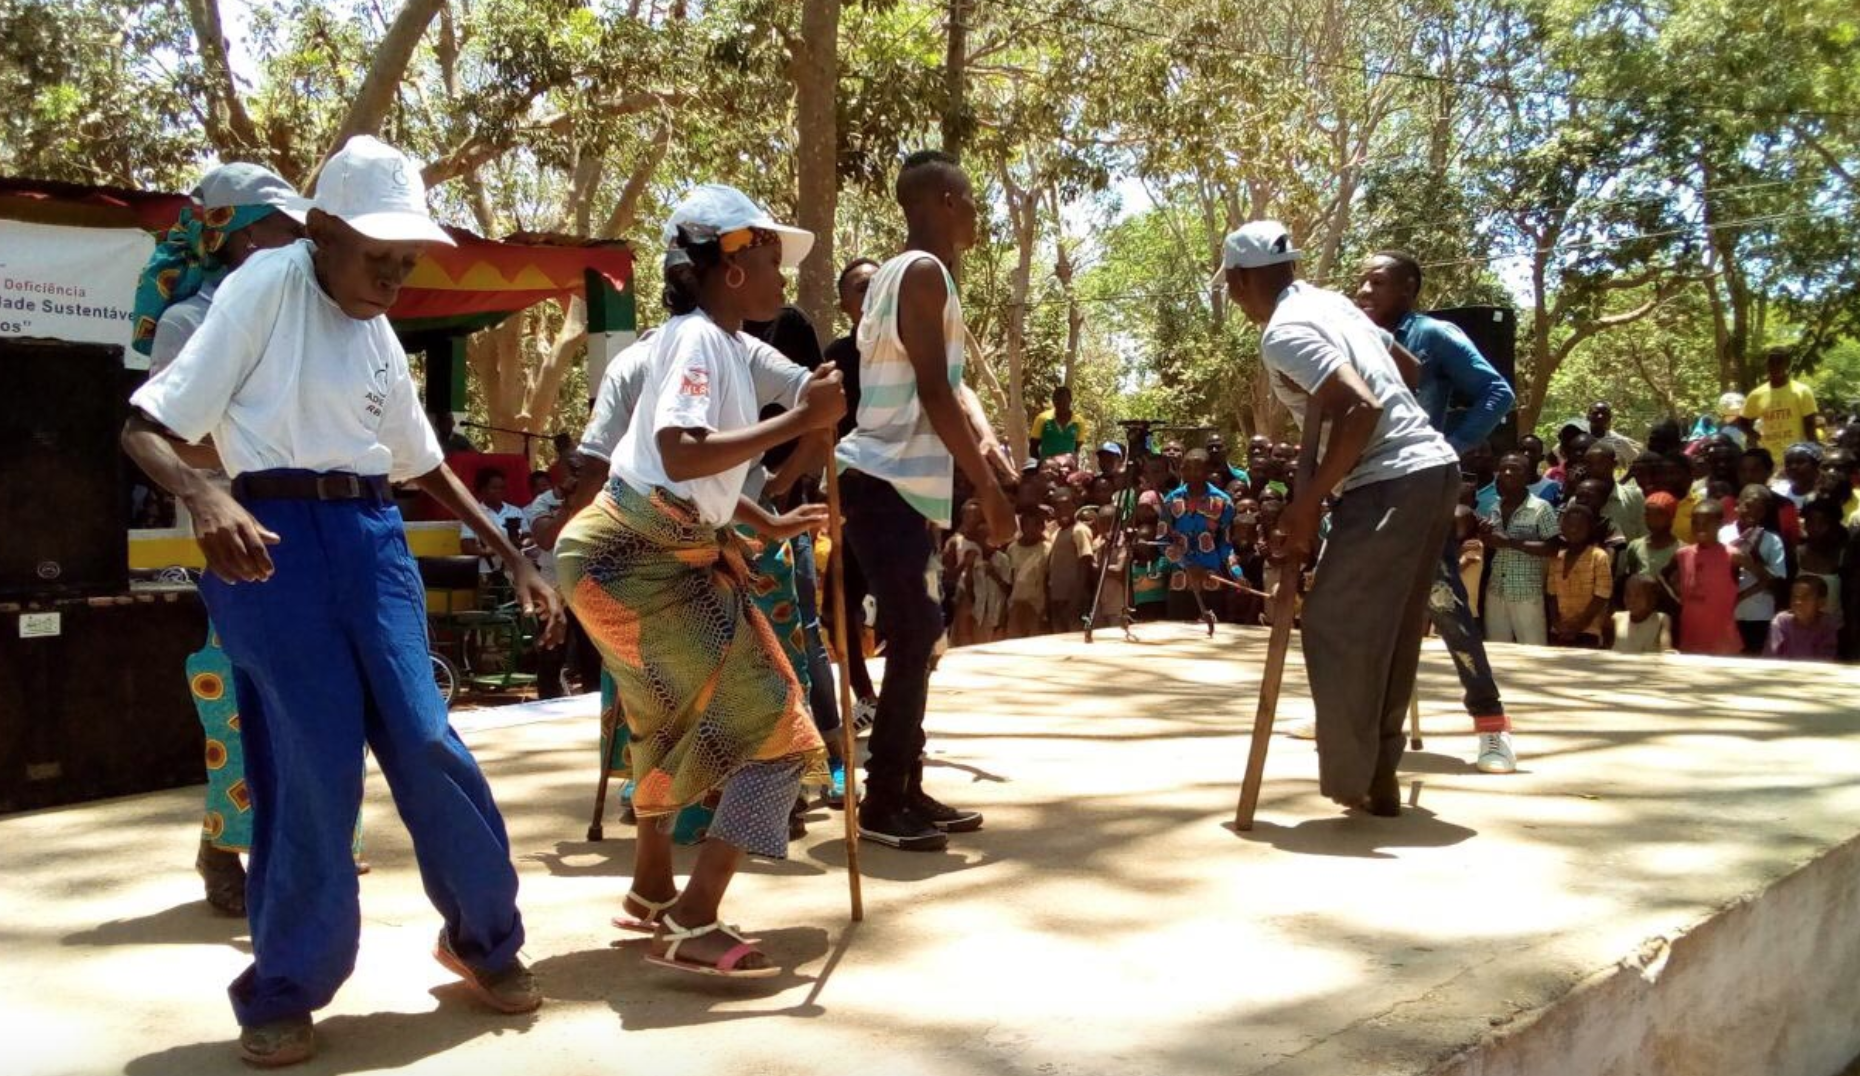 Dancers at a fair in Namialo, Mozambique.